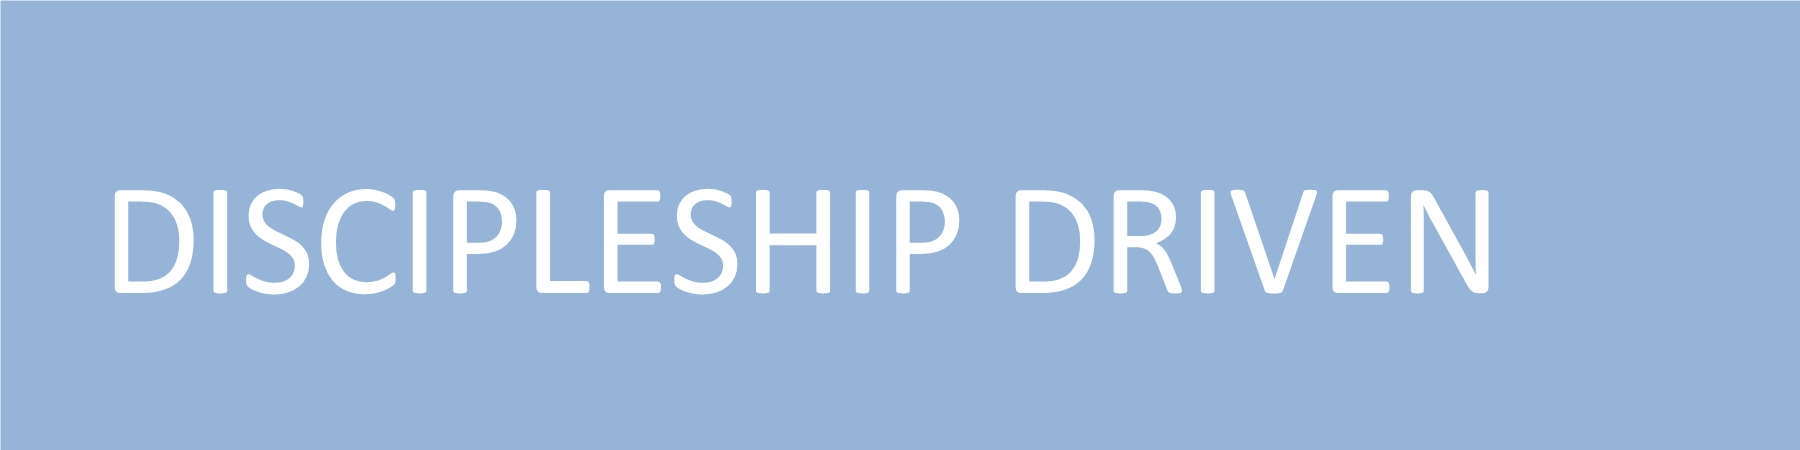 Discipleship Driven